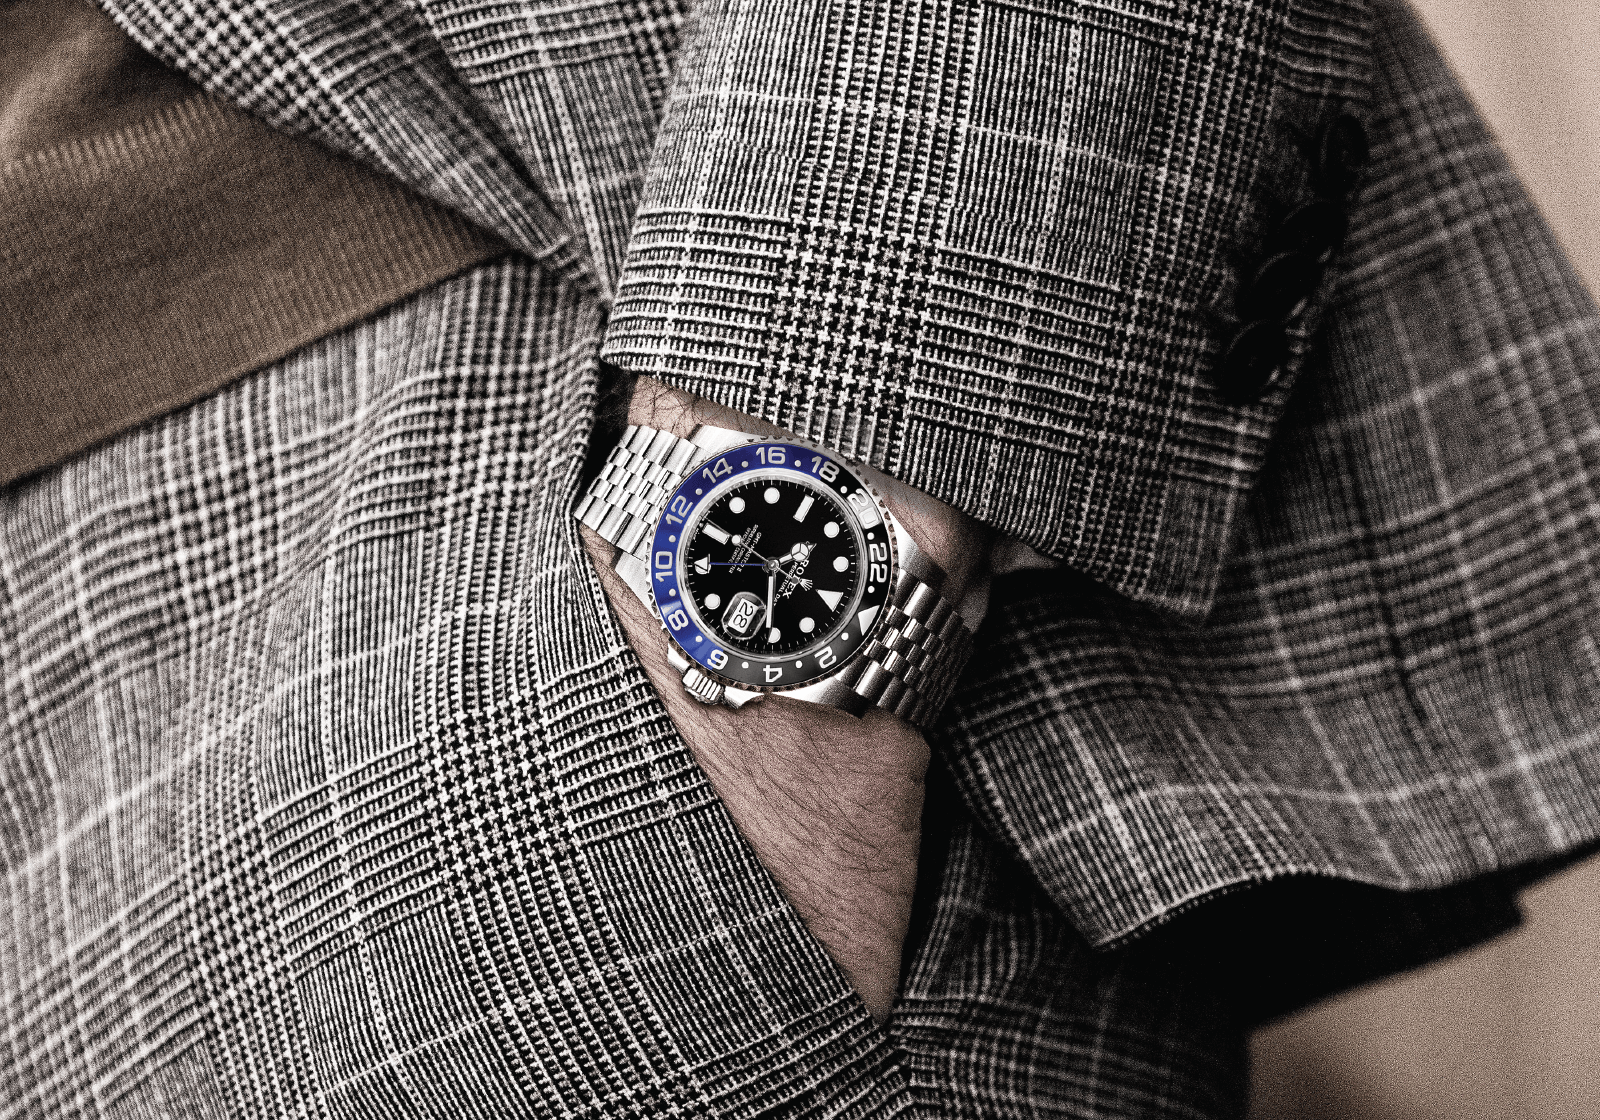 Rolex | GMT-Master II Ref. 126710BLNR | Corda Automática | Oystersteel | Ø 40 mm | Relógio cedido por Rolex © Paulo Pires / Espiral do Tempo